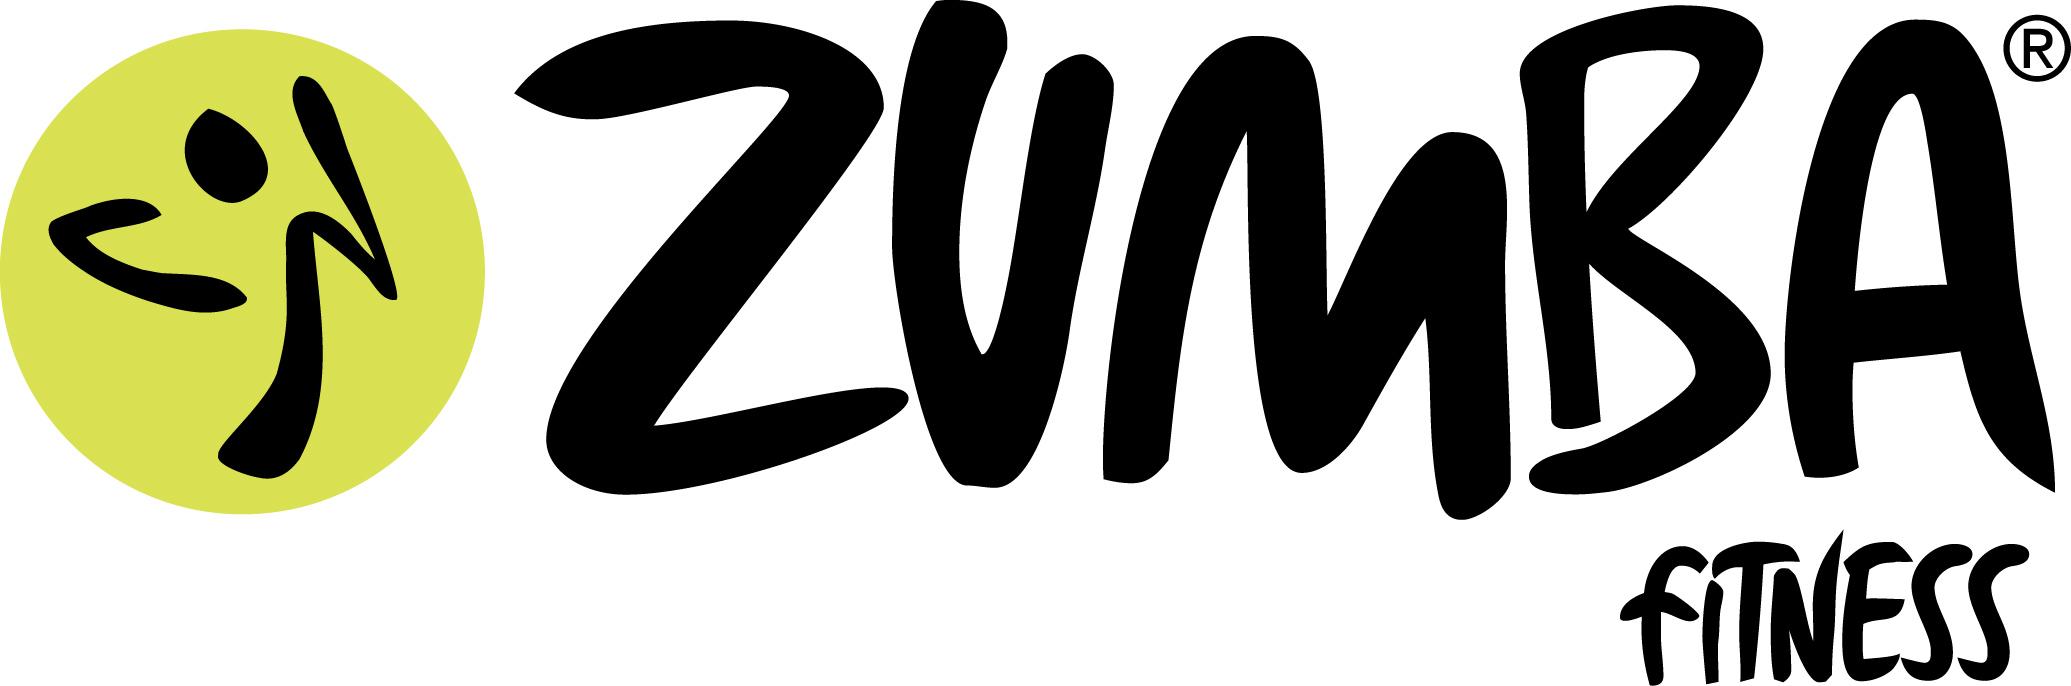 Zumba/ Exercise.